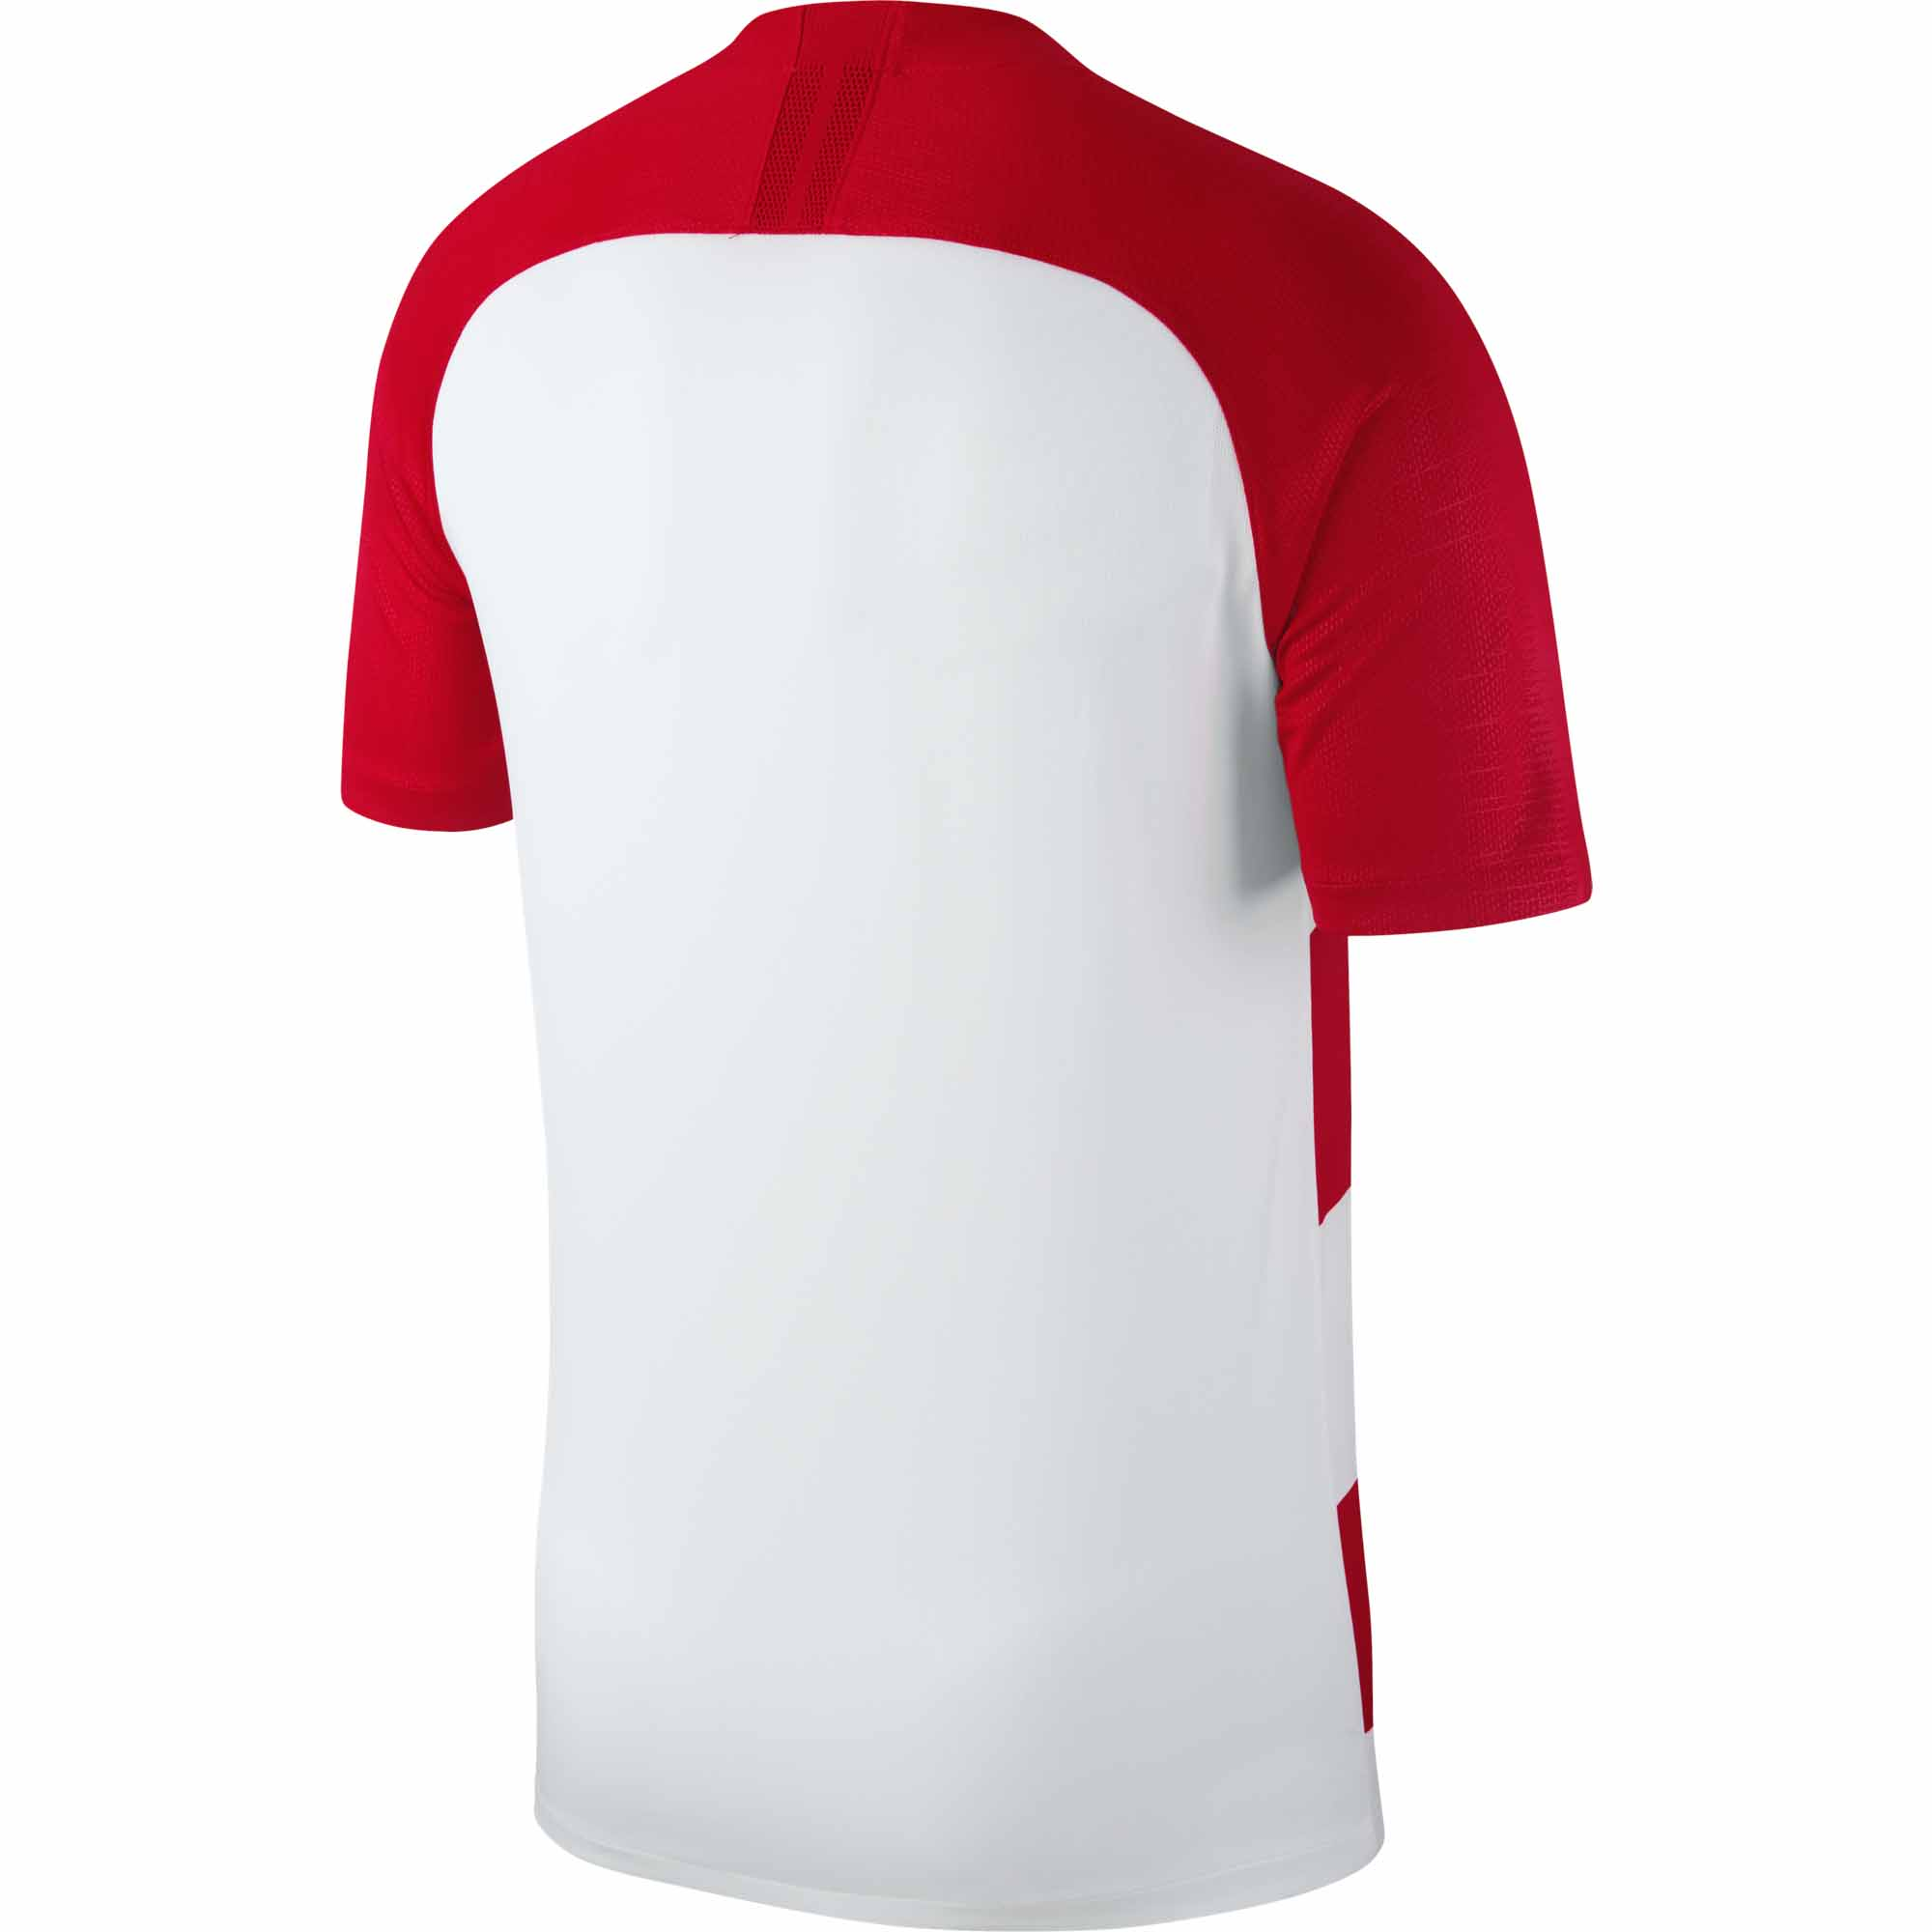 37278153a54 Nike Croatia Home Jersey 2018-19 - SoccerPro.com